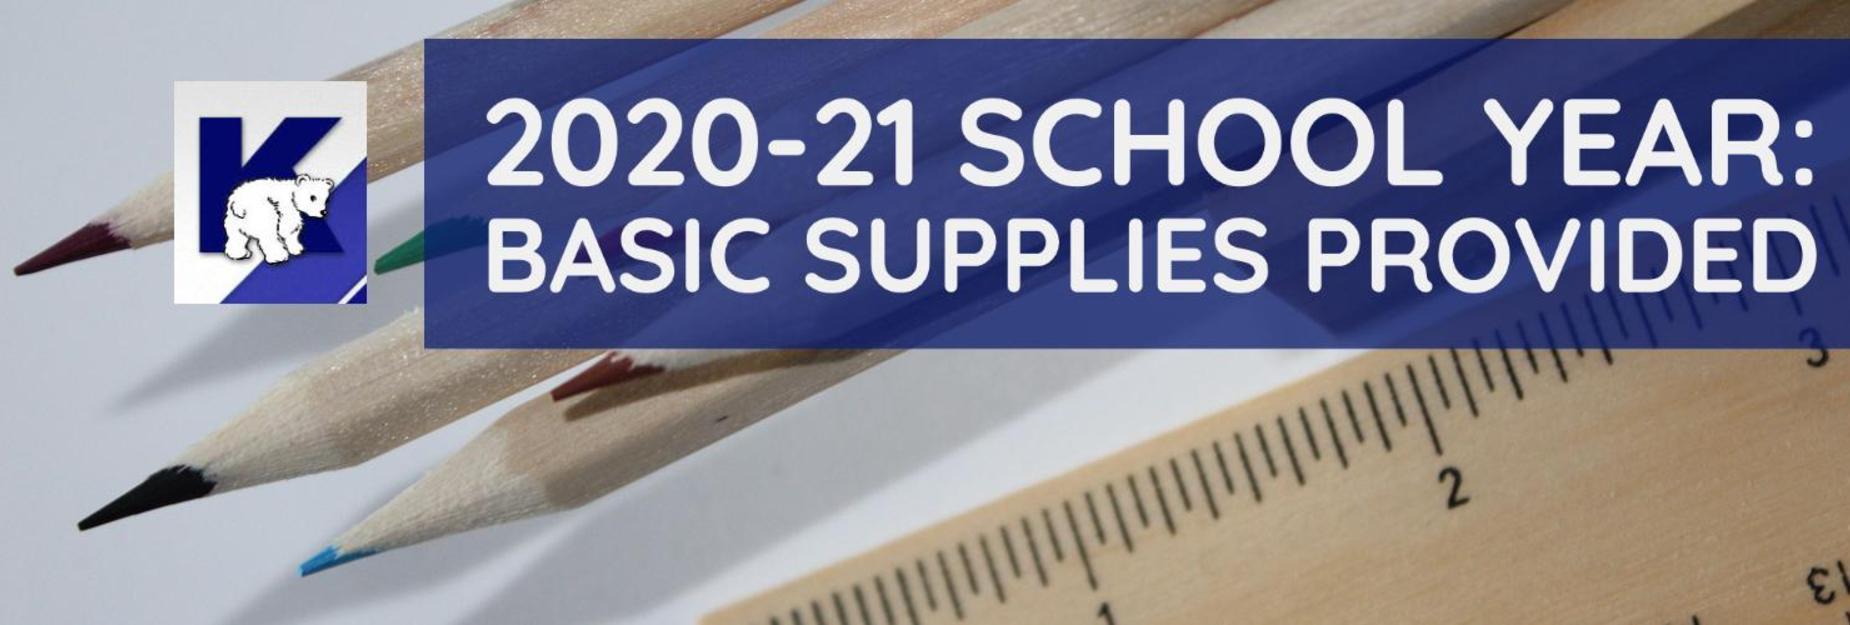 school supplies provided